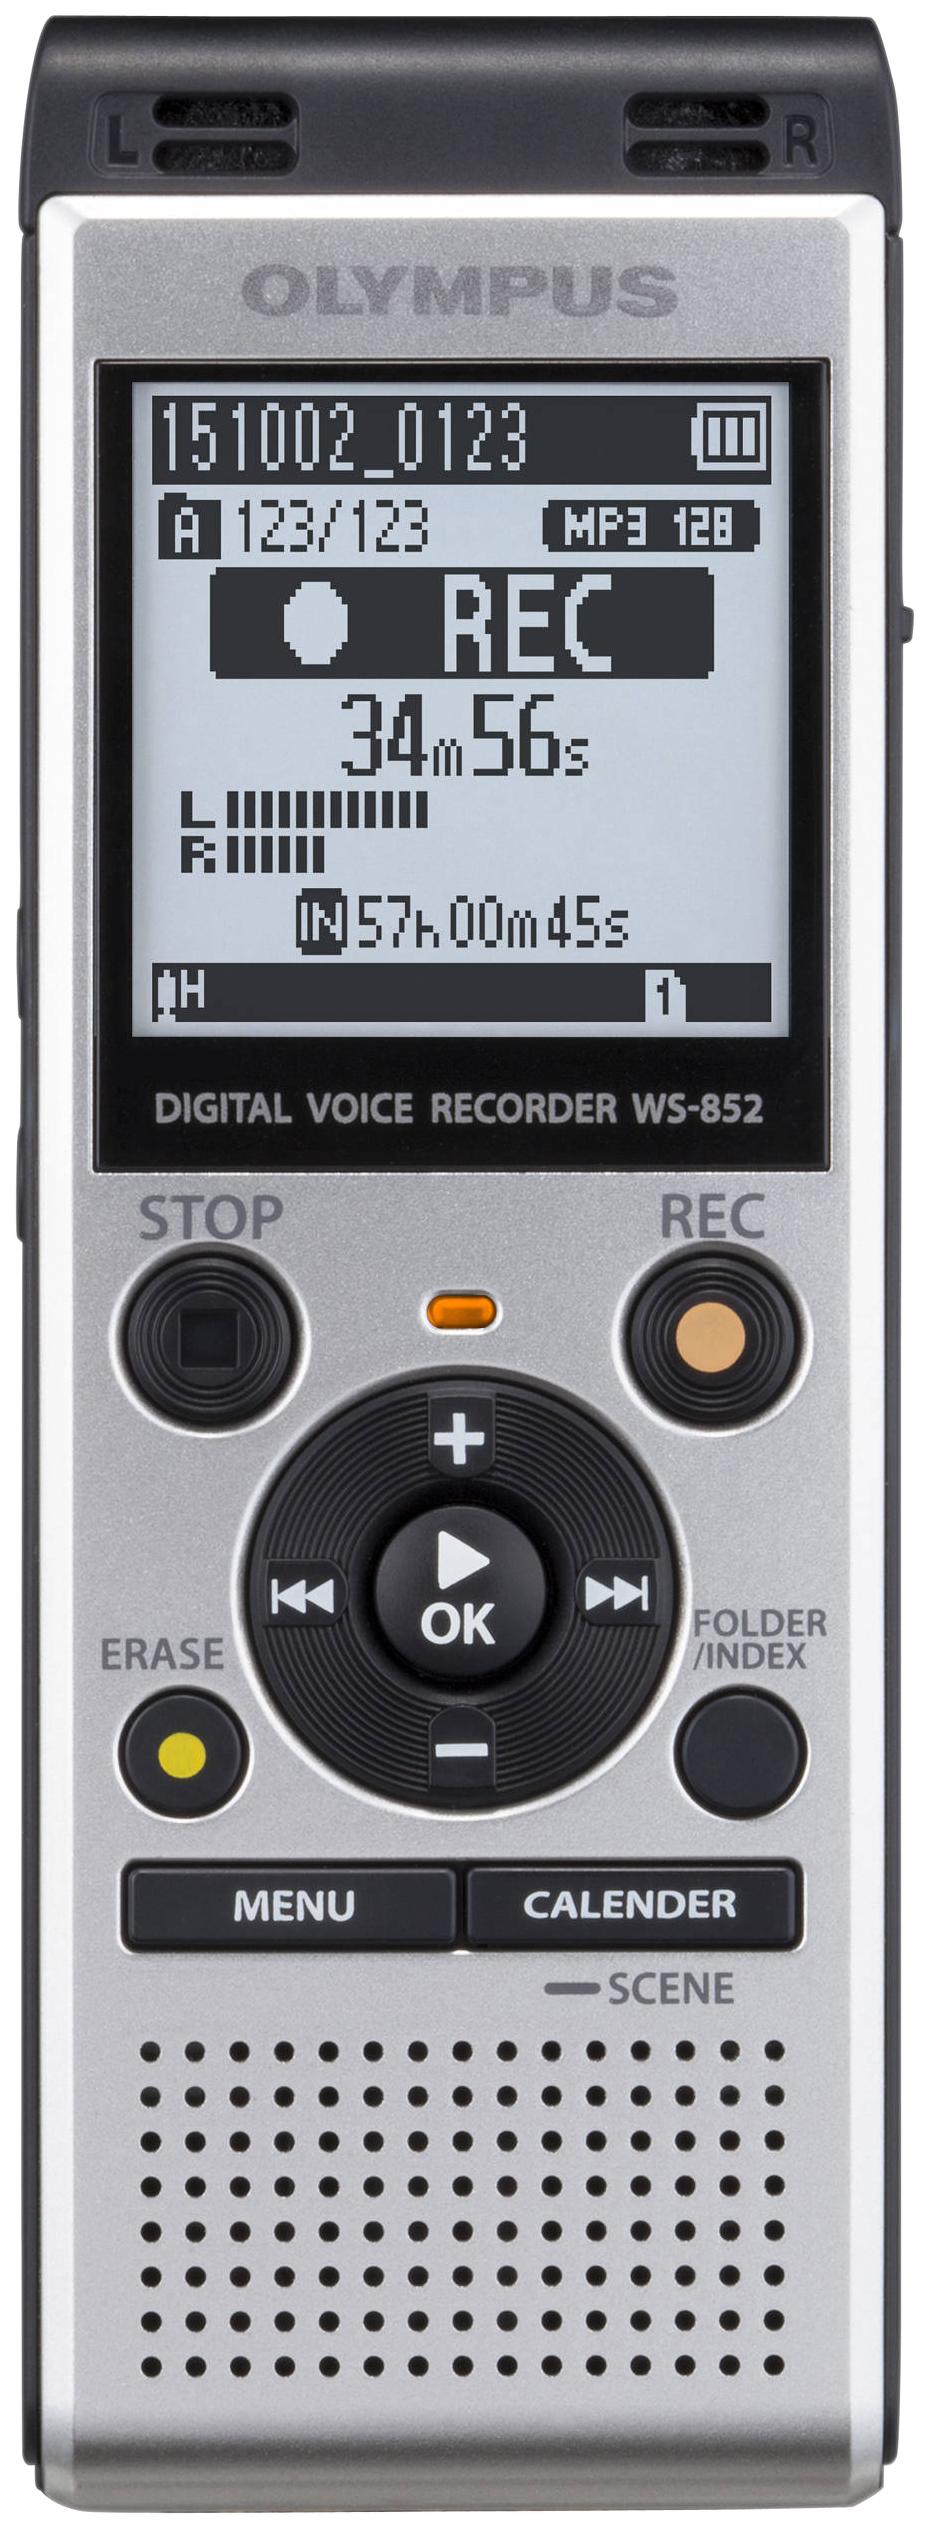 Диктофон цифровой Olympus WS-852 V415121SE000.